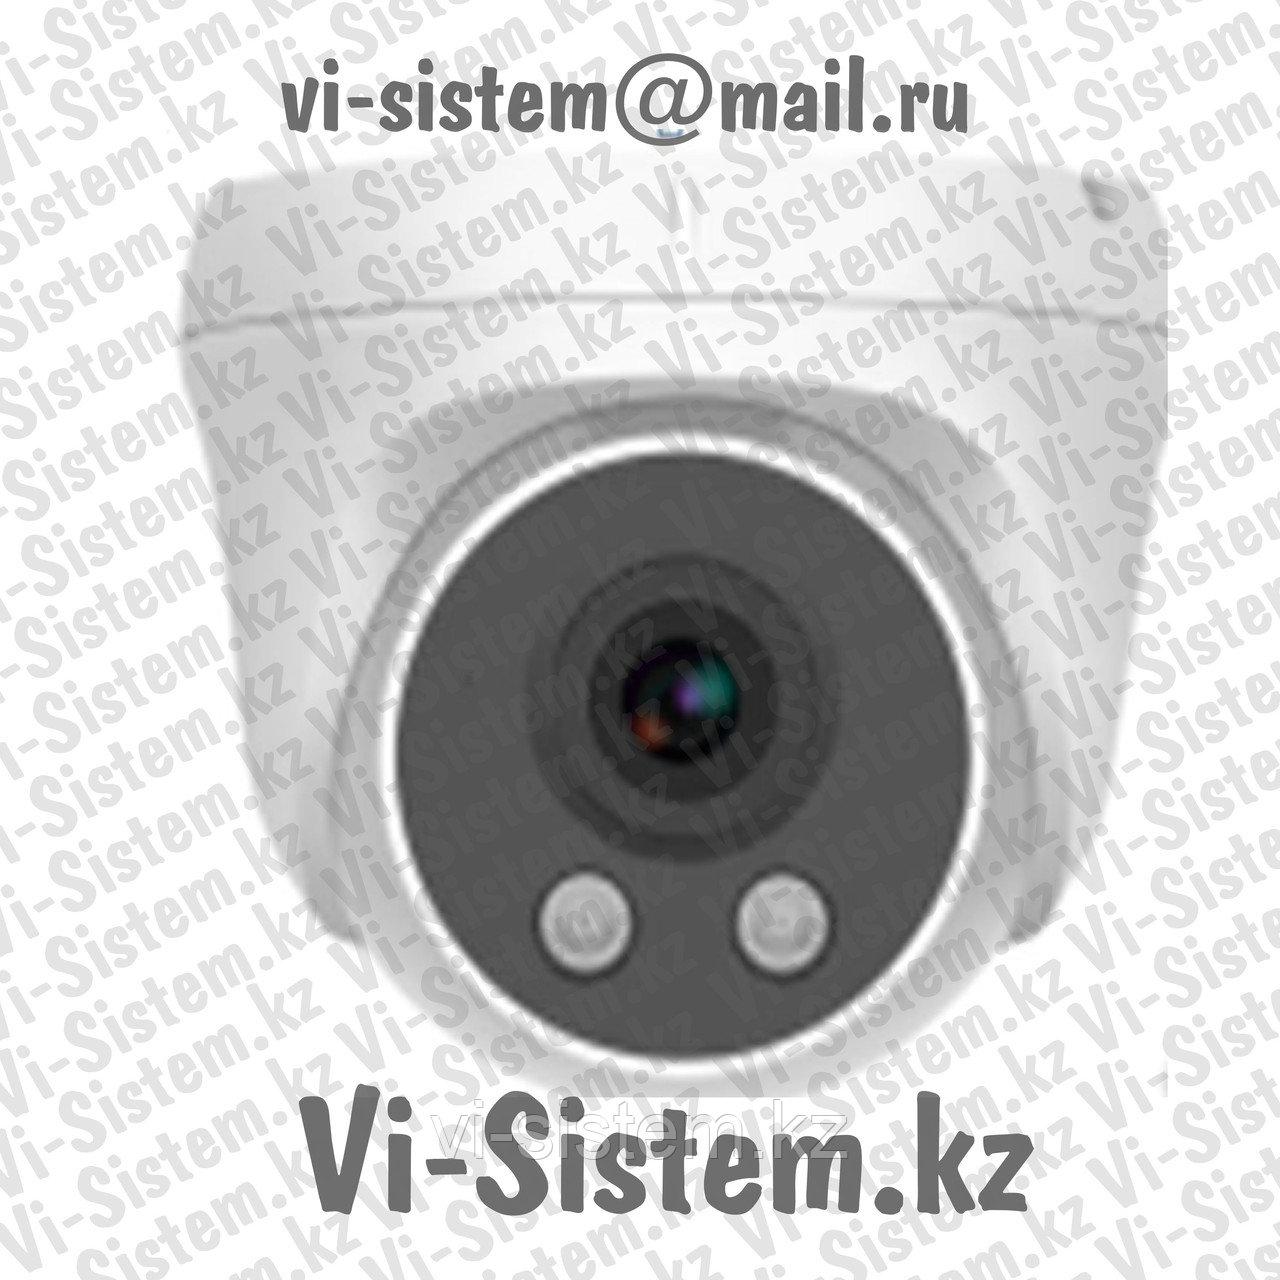 IP-Видеокамера SYNCAR SU-810 2MP StarLight